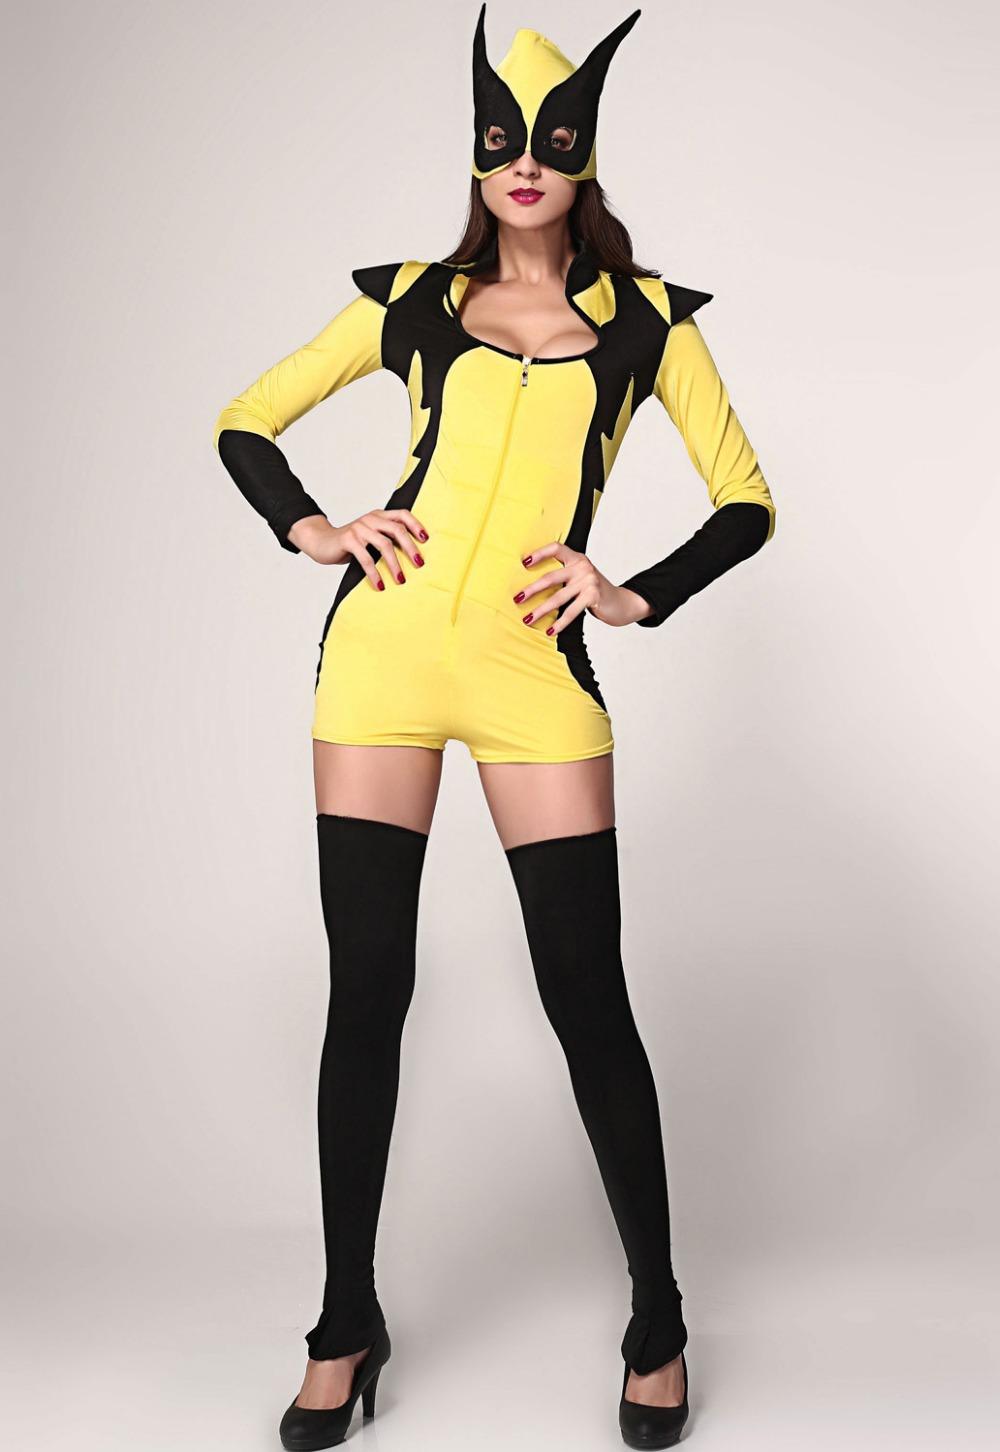 Yellow Masked Super Hero Costume  LC8734  fantasy womenОдежда и ак�е��уары<br><br><br>Aliexpress